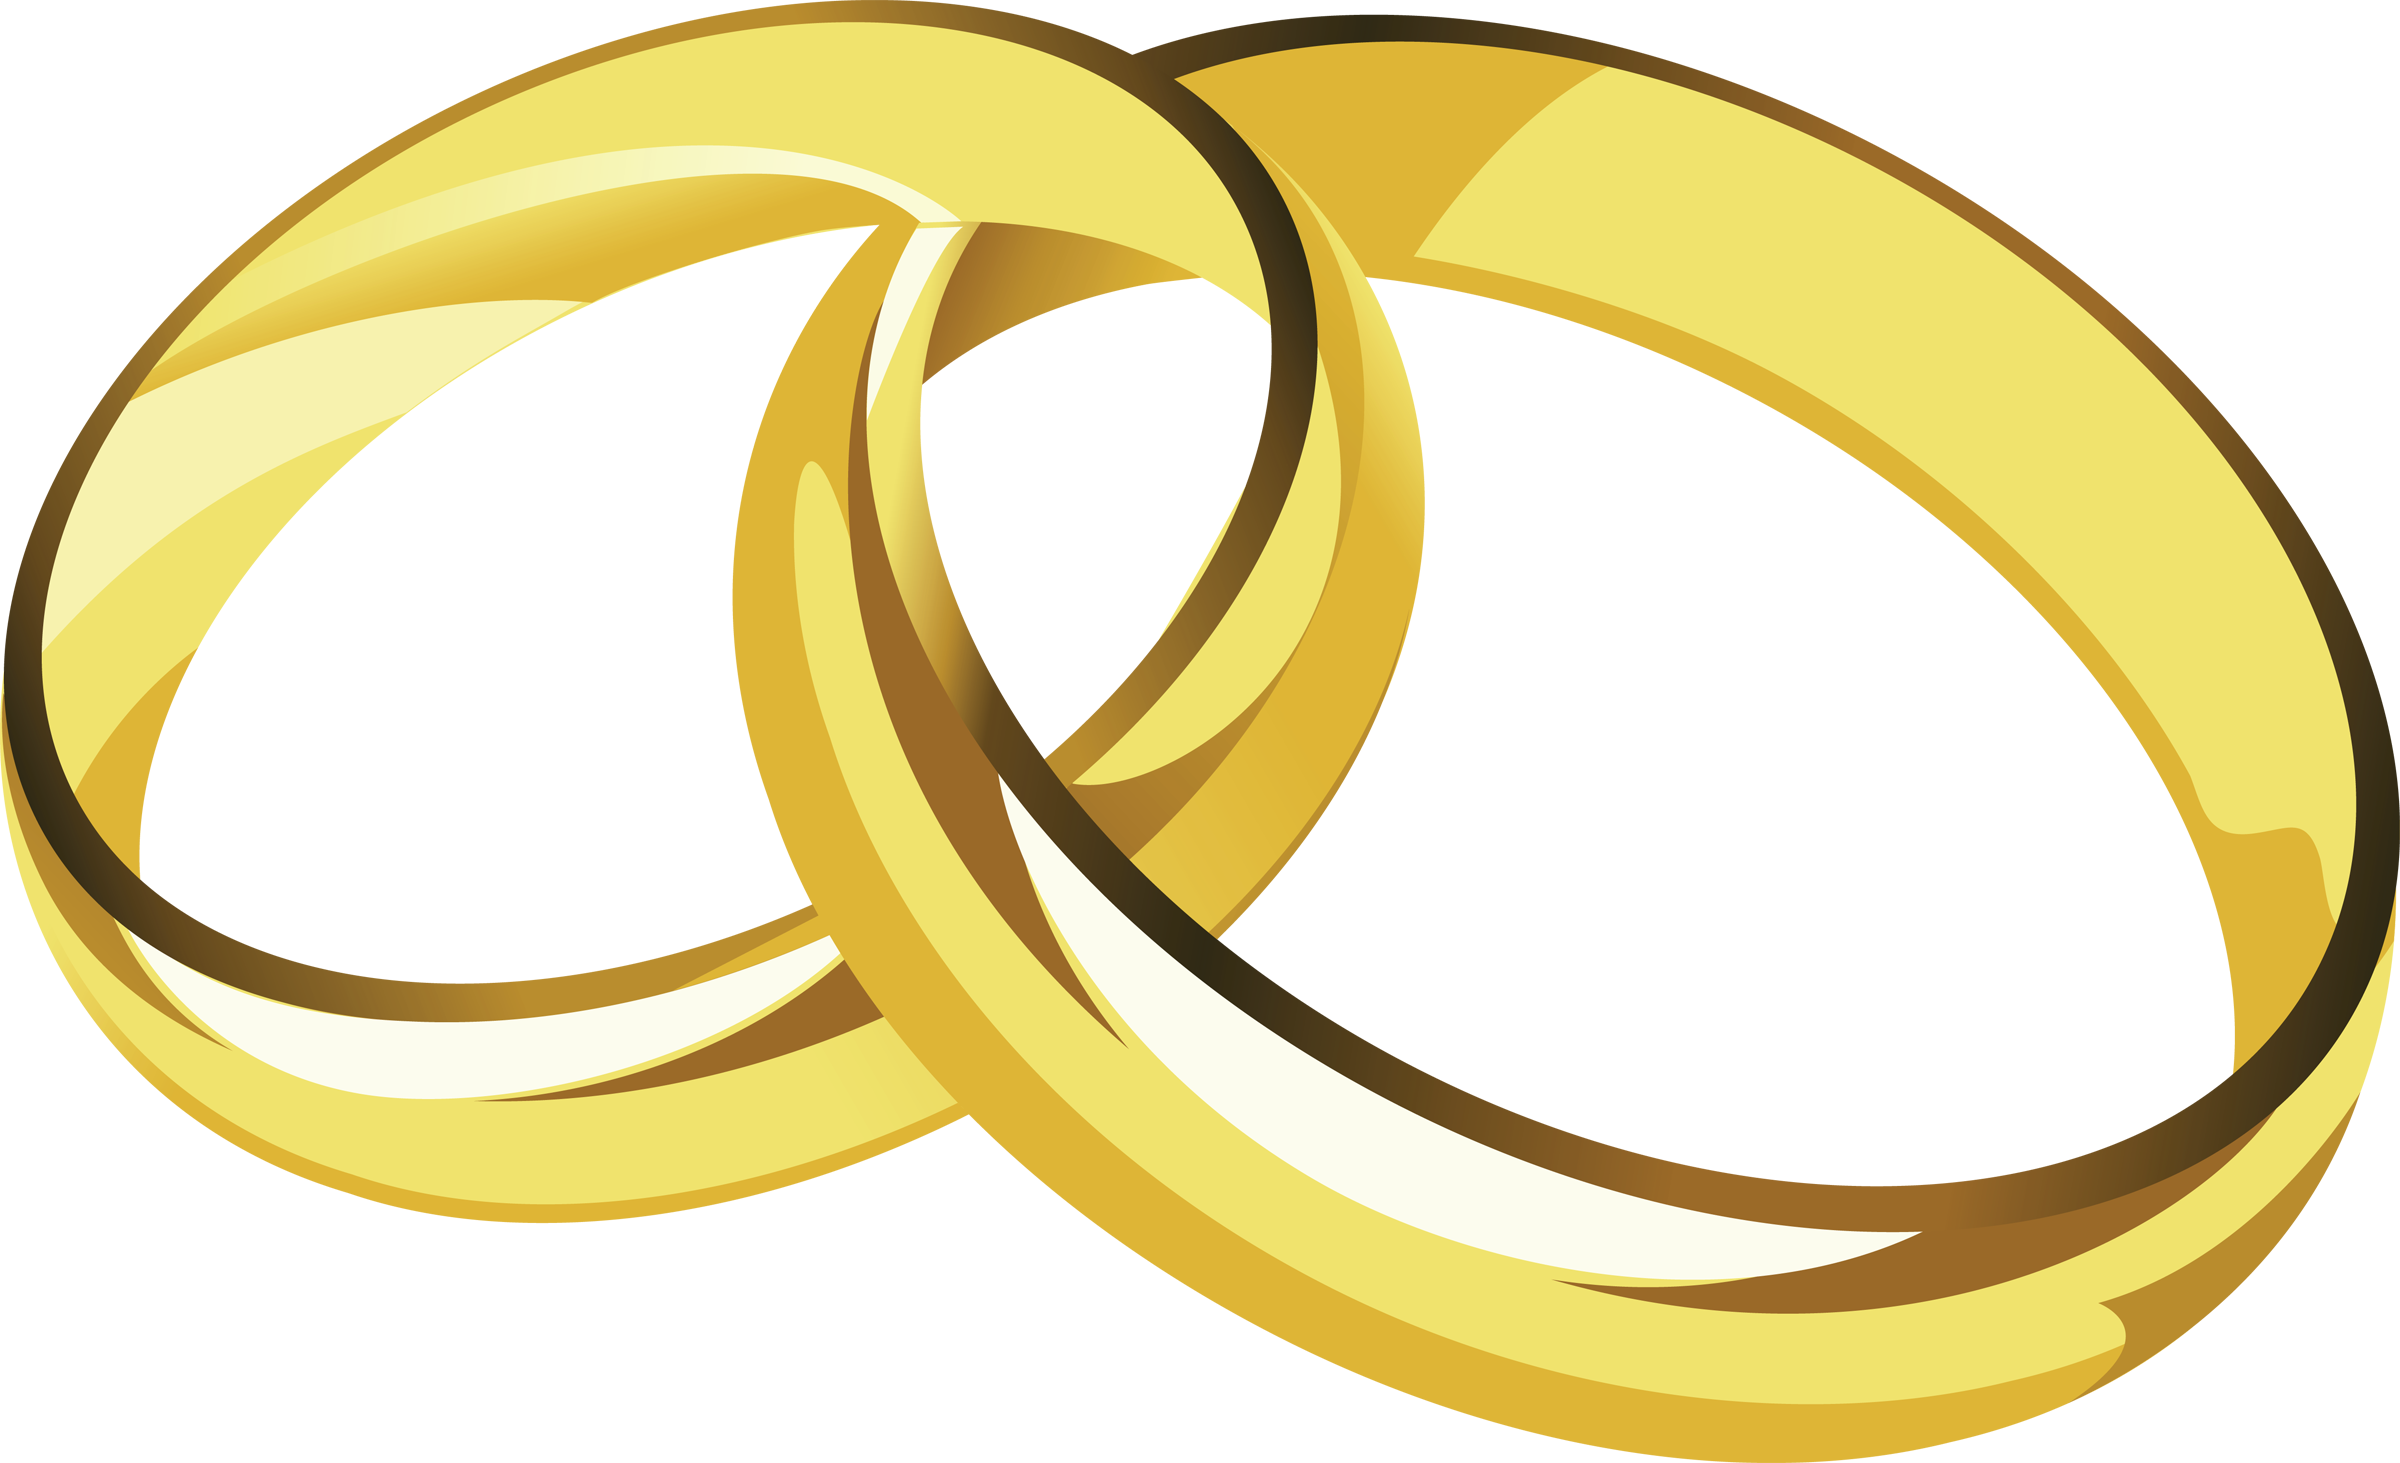 Cartoonized Wedding Ring